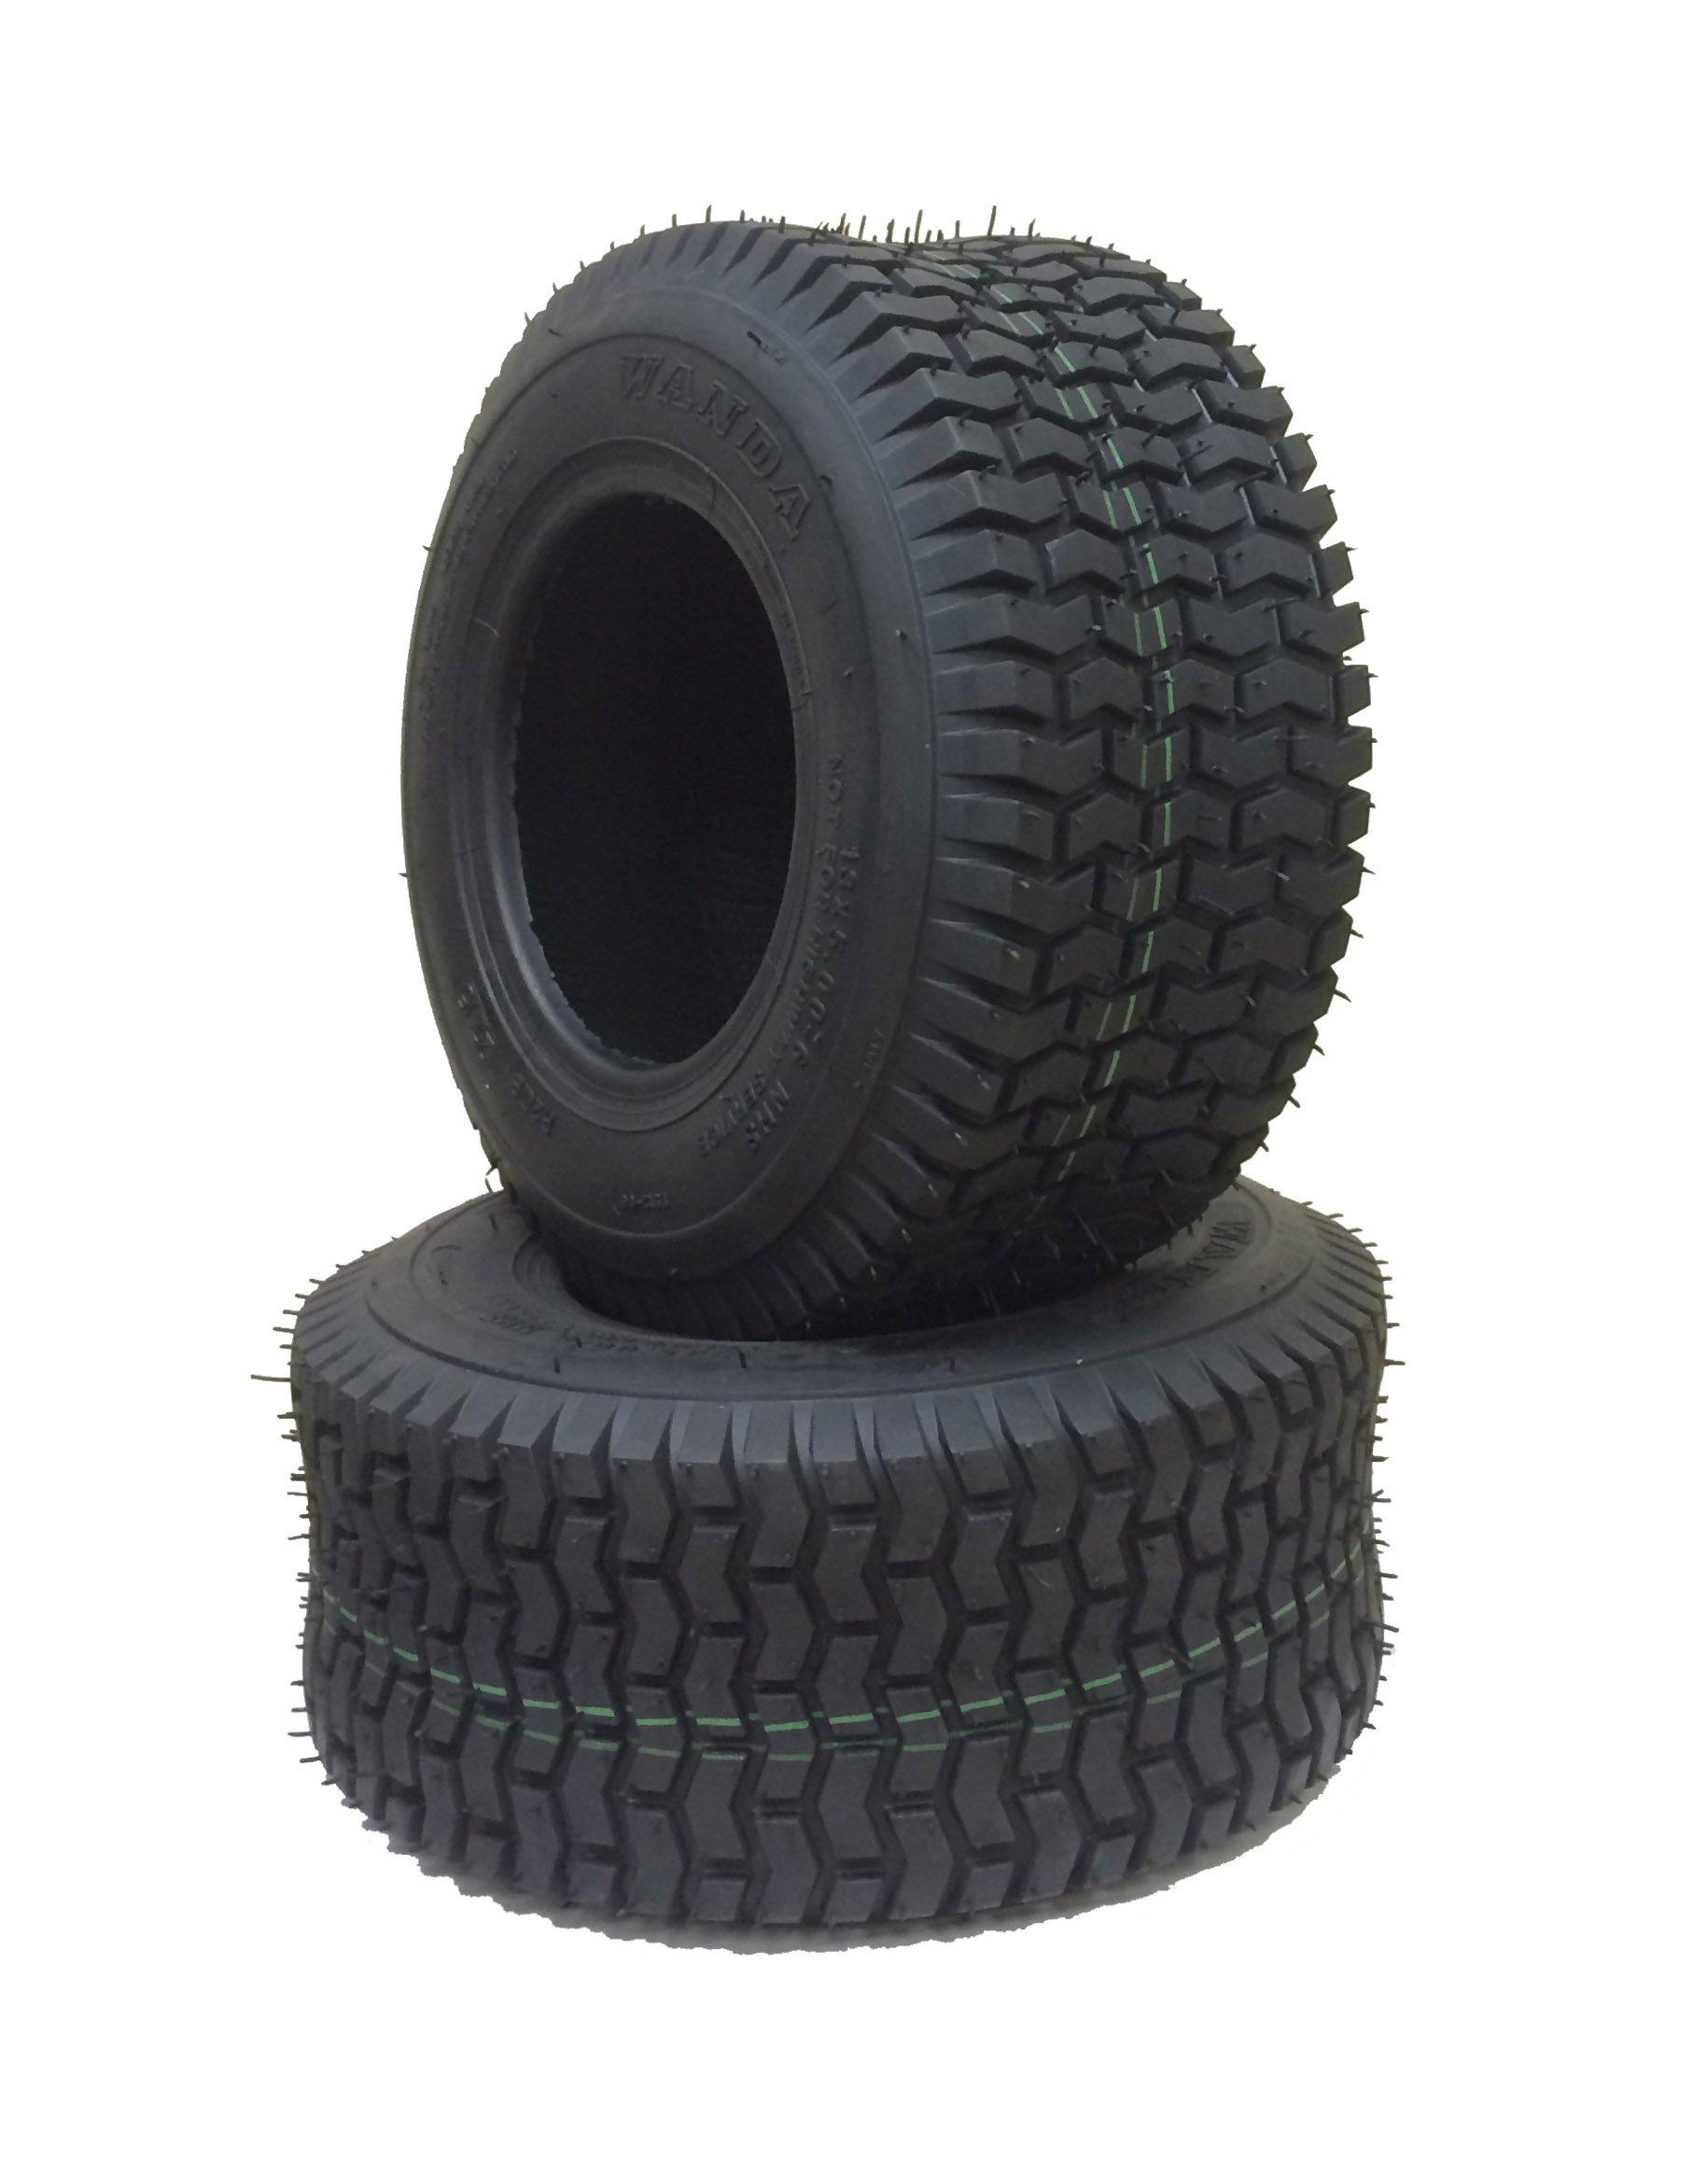 2 New 13x5.00-6 Lawn Mower Utility Cart Turf Tires /4PR - 13106